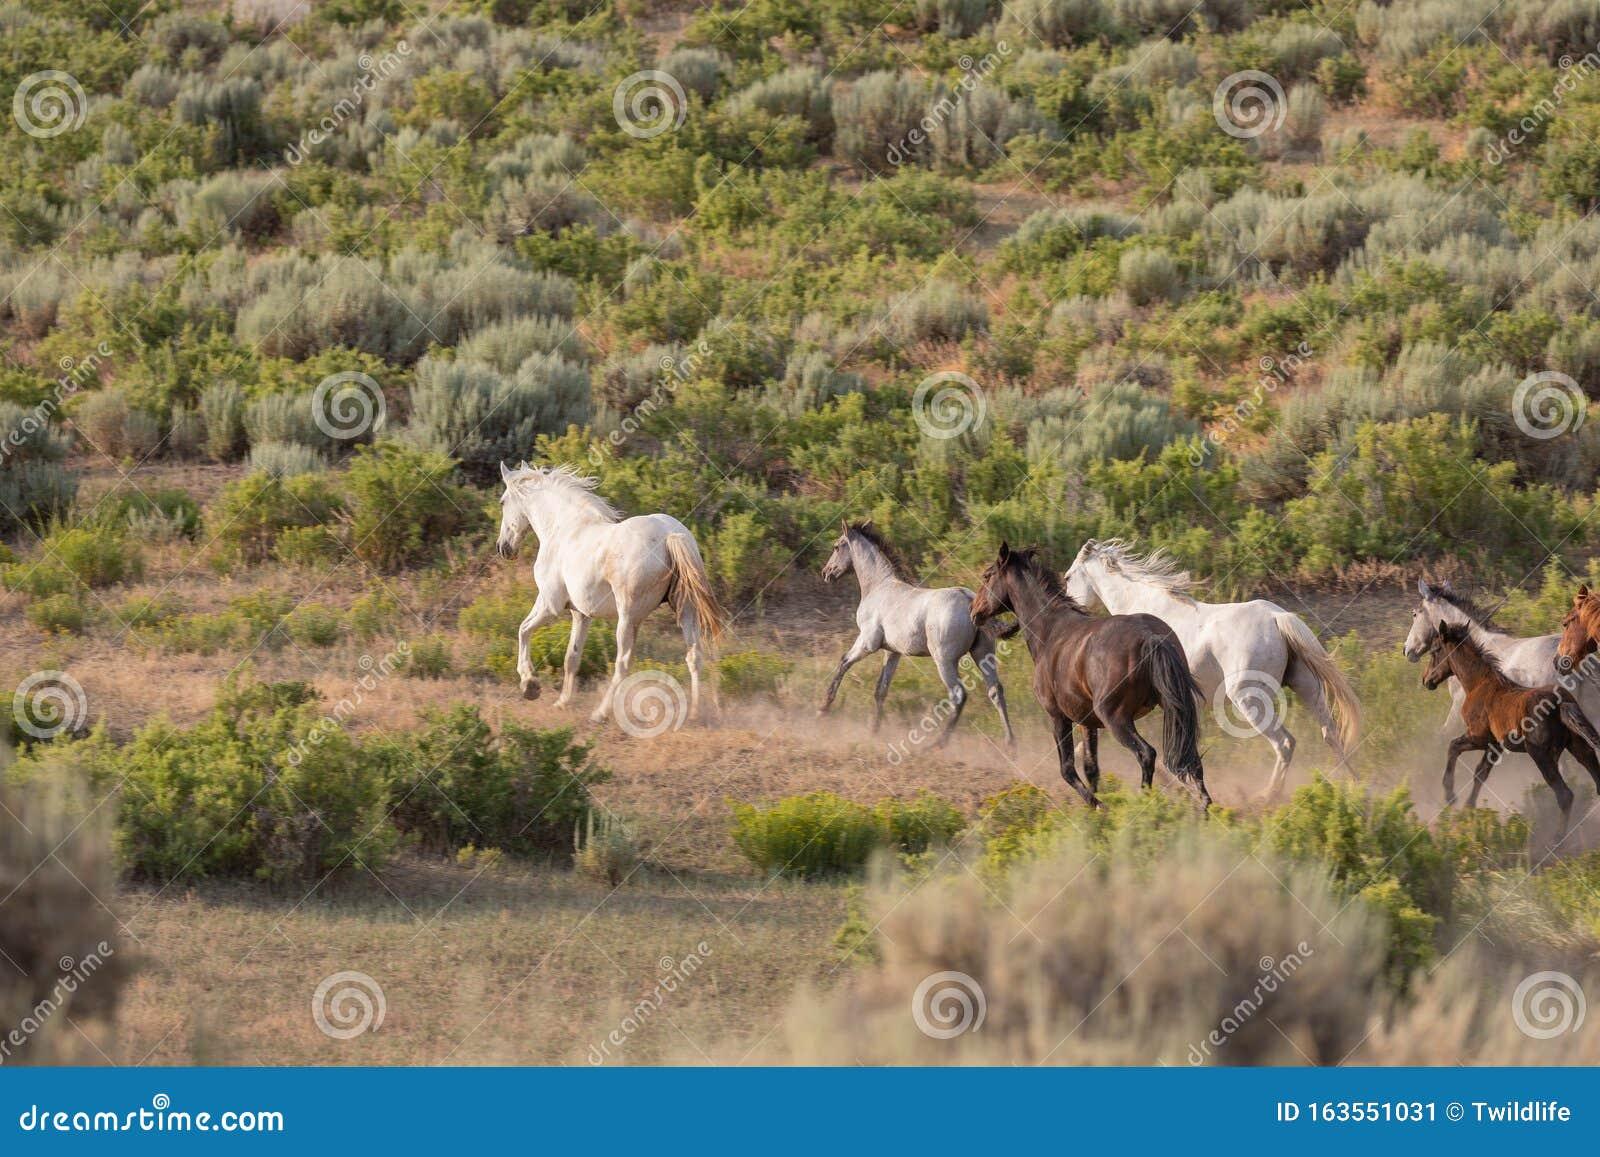 Wild Horses Running Stock Image Image Of Summer Mammal 163551031